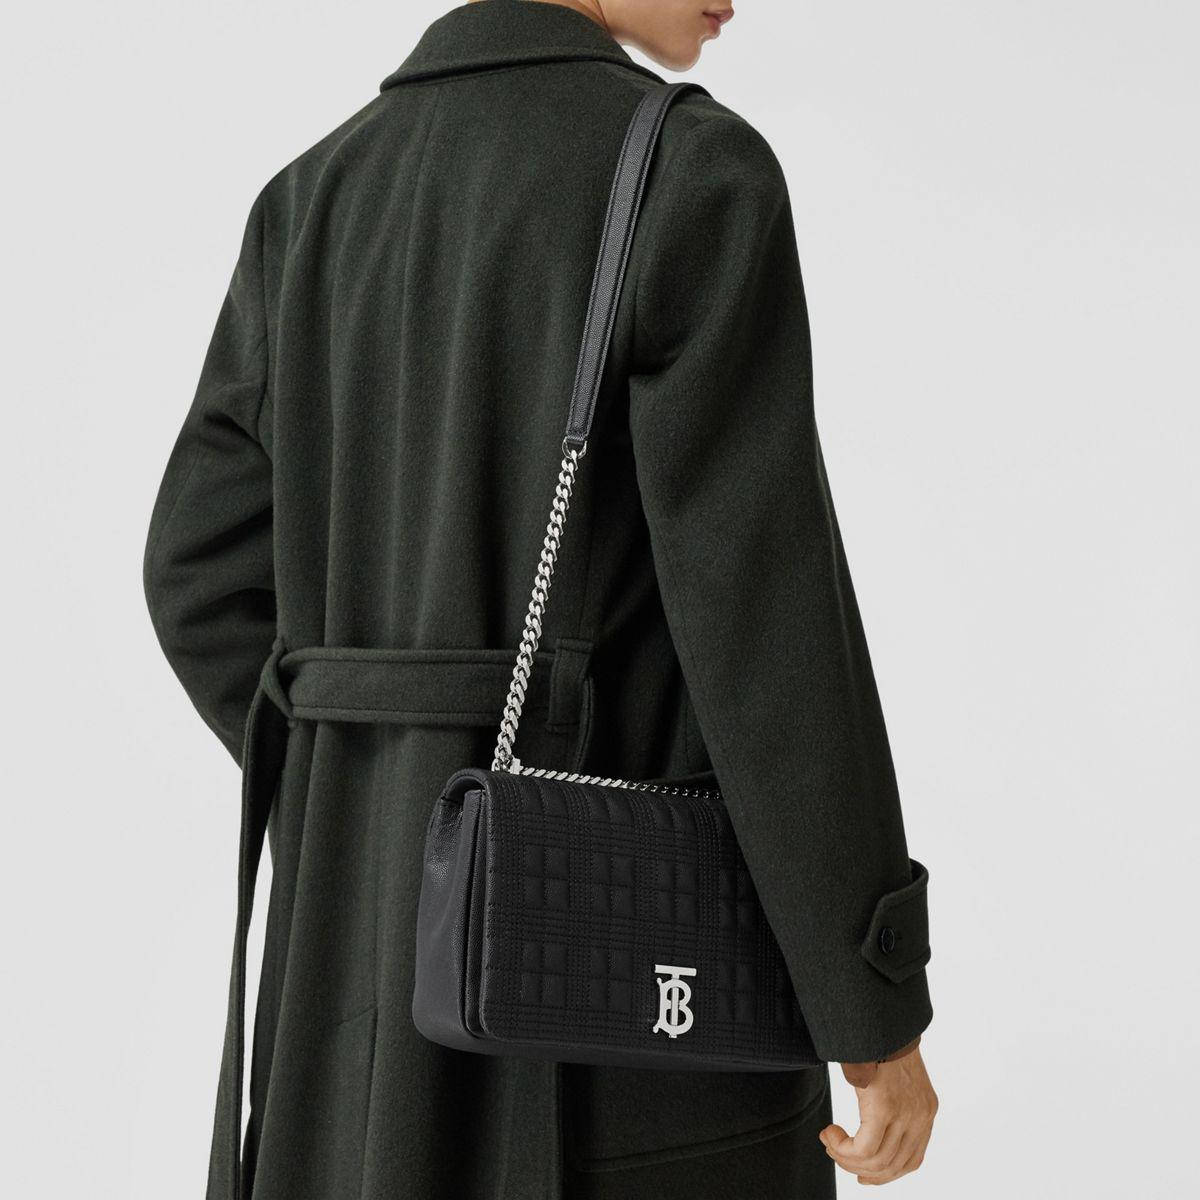 "Burberry Leder Mittelgroße Handtasche ""Lola"" aus genarbtem, gestepptem Leder in Schwarz  D8g3p"